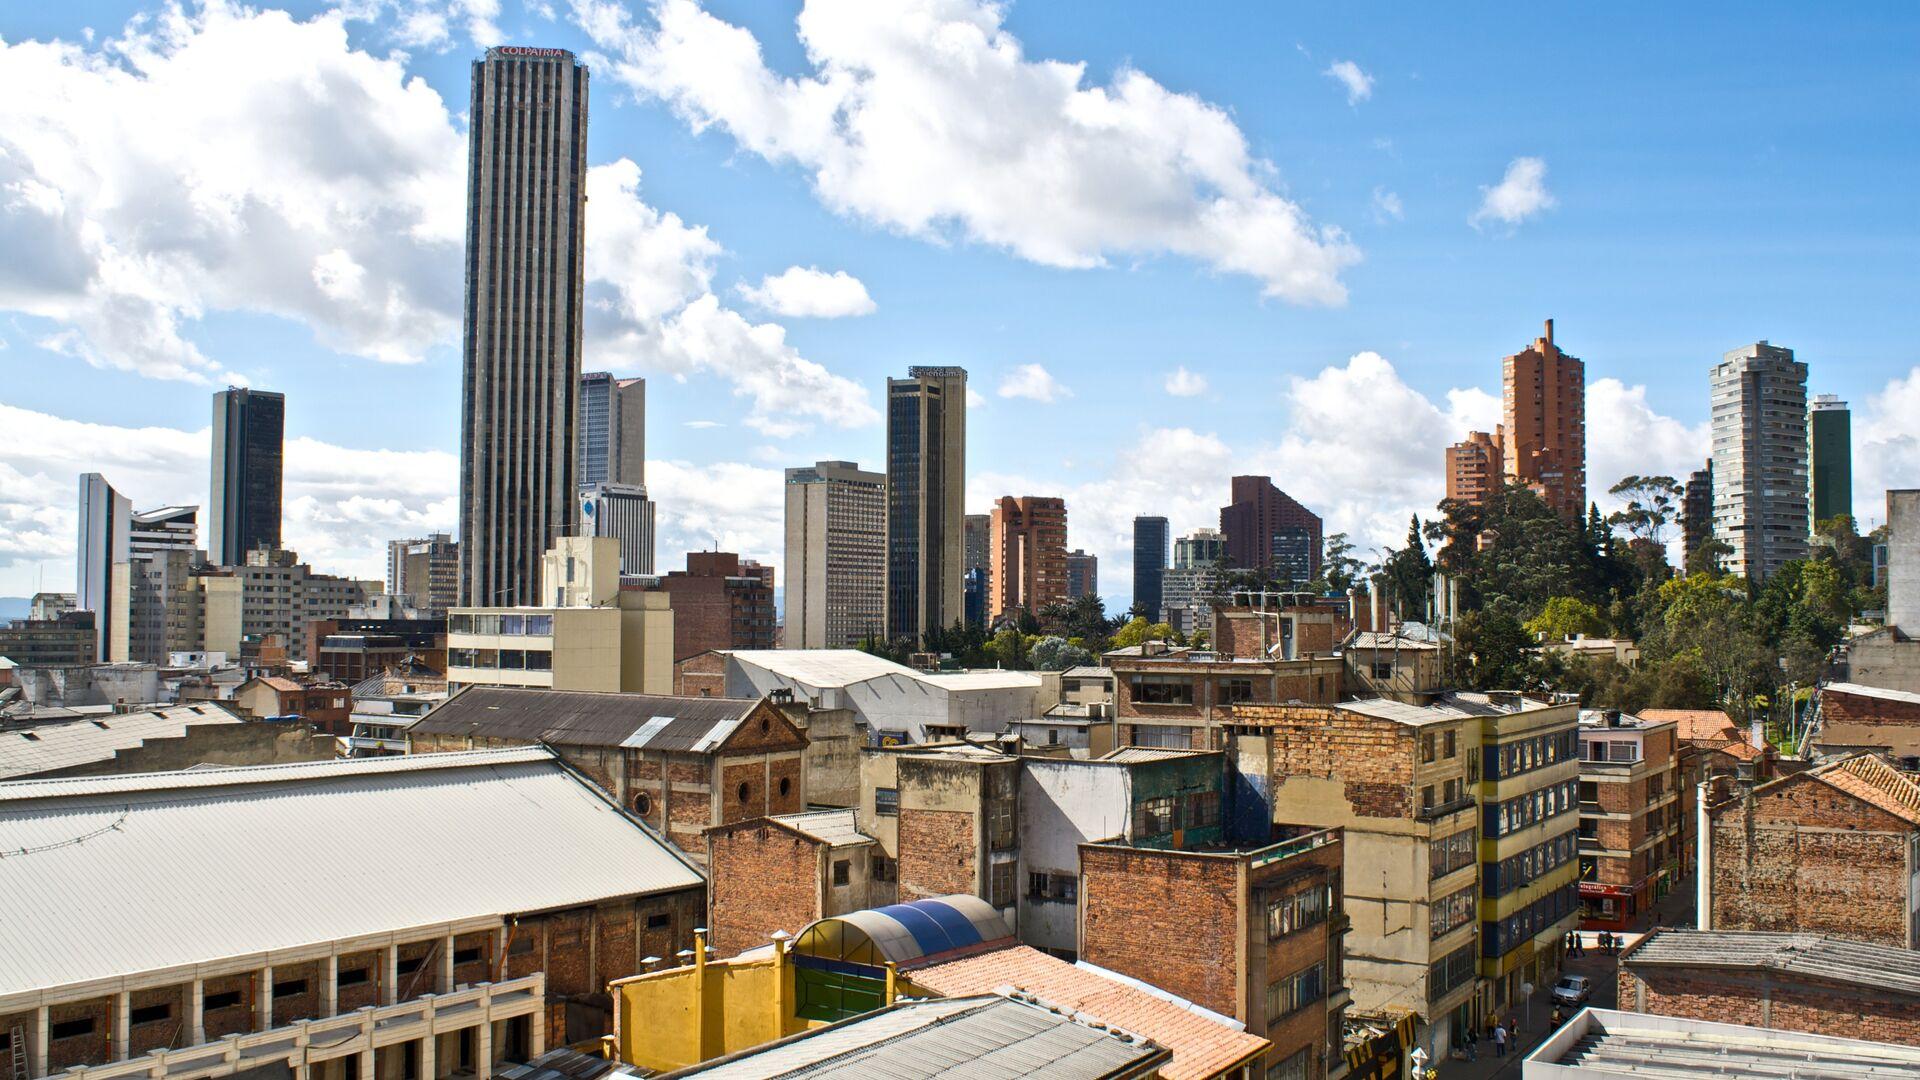 Bogotá, la capital de Colombia - Sputnik Mundo, 1920, 16.04.2021